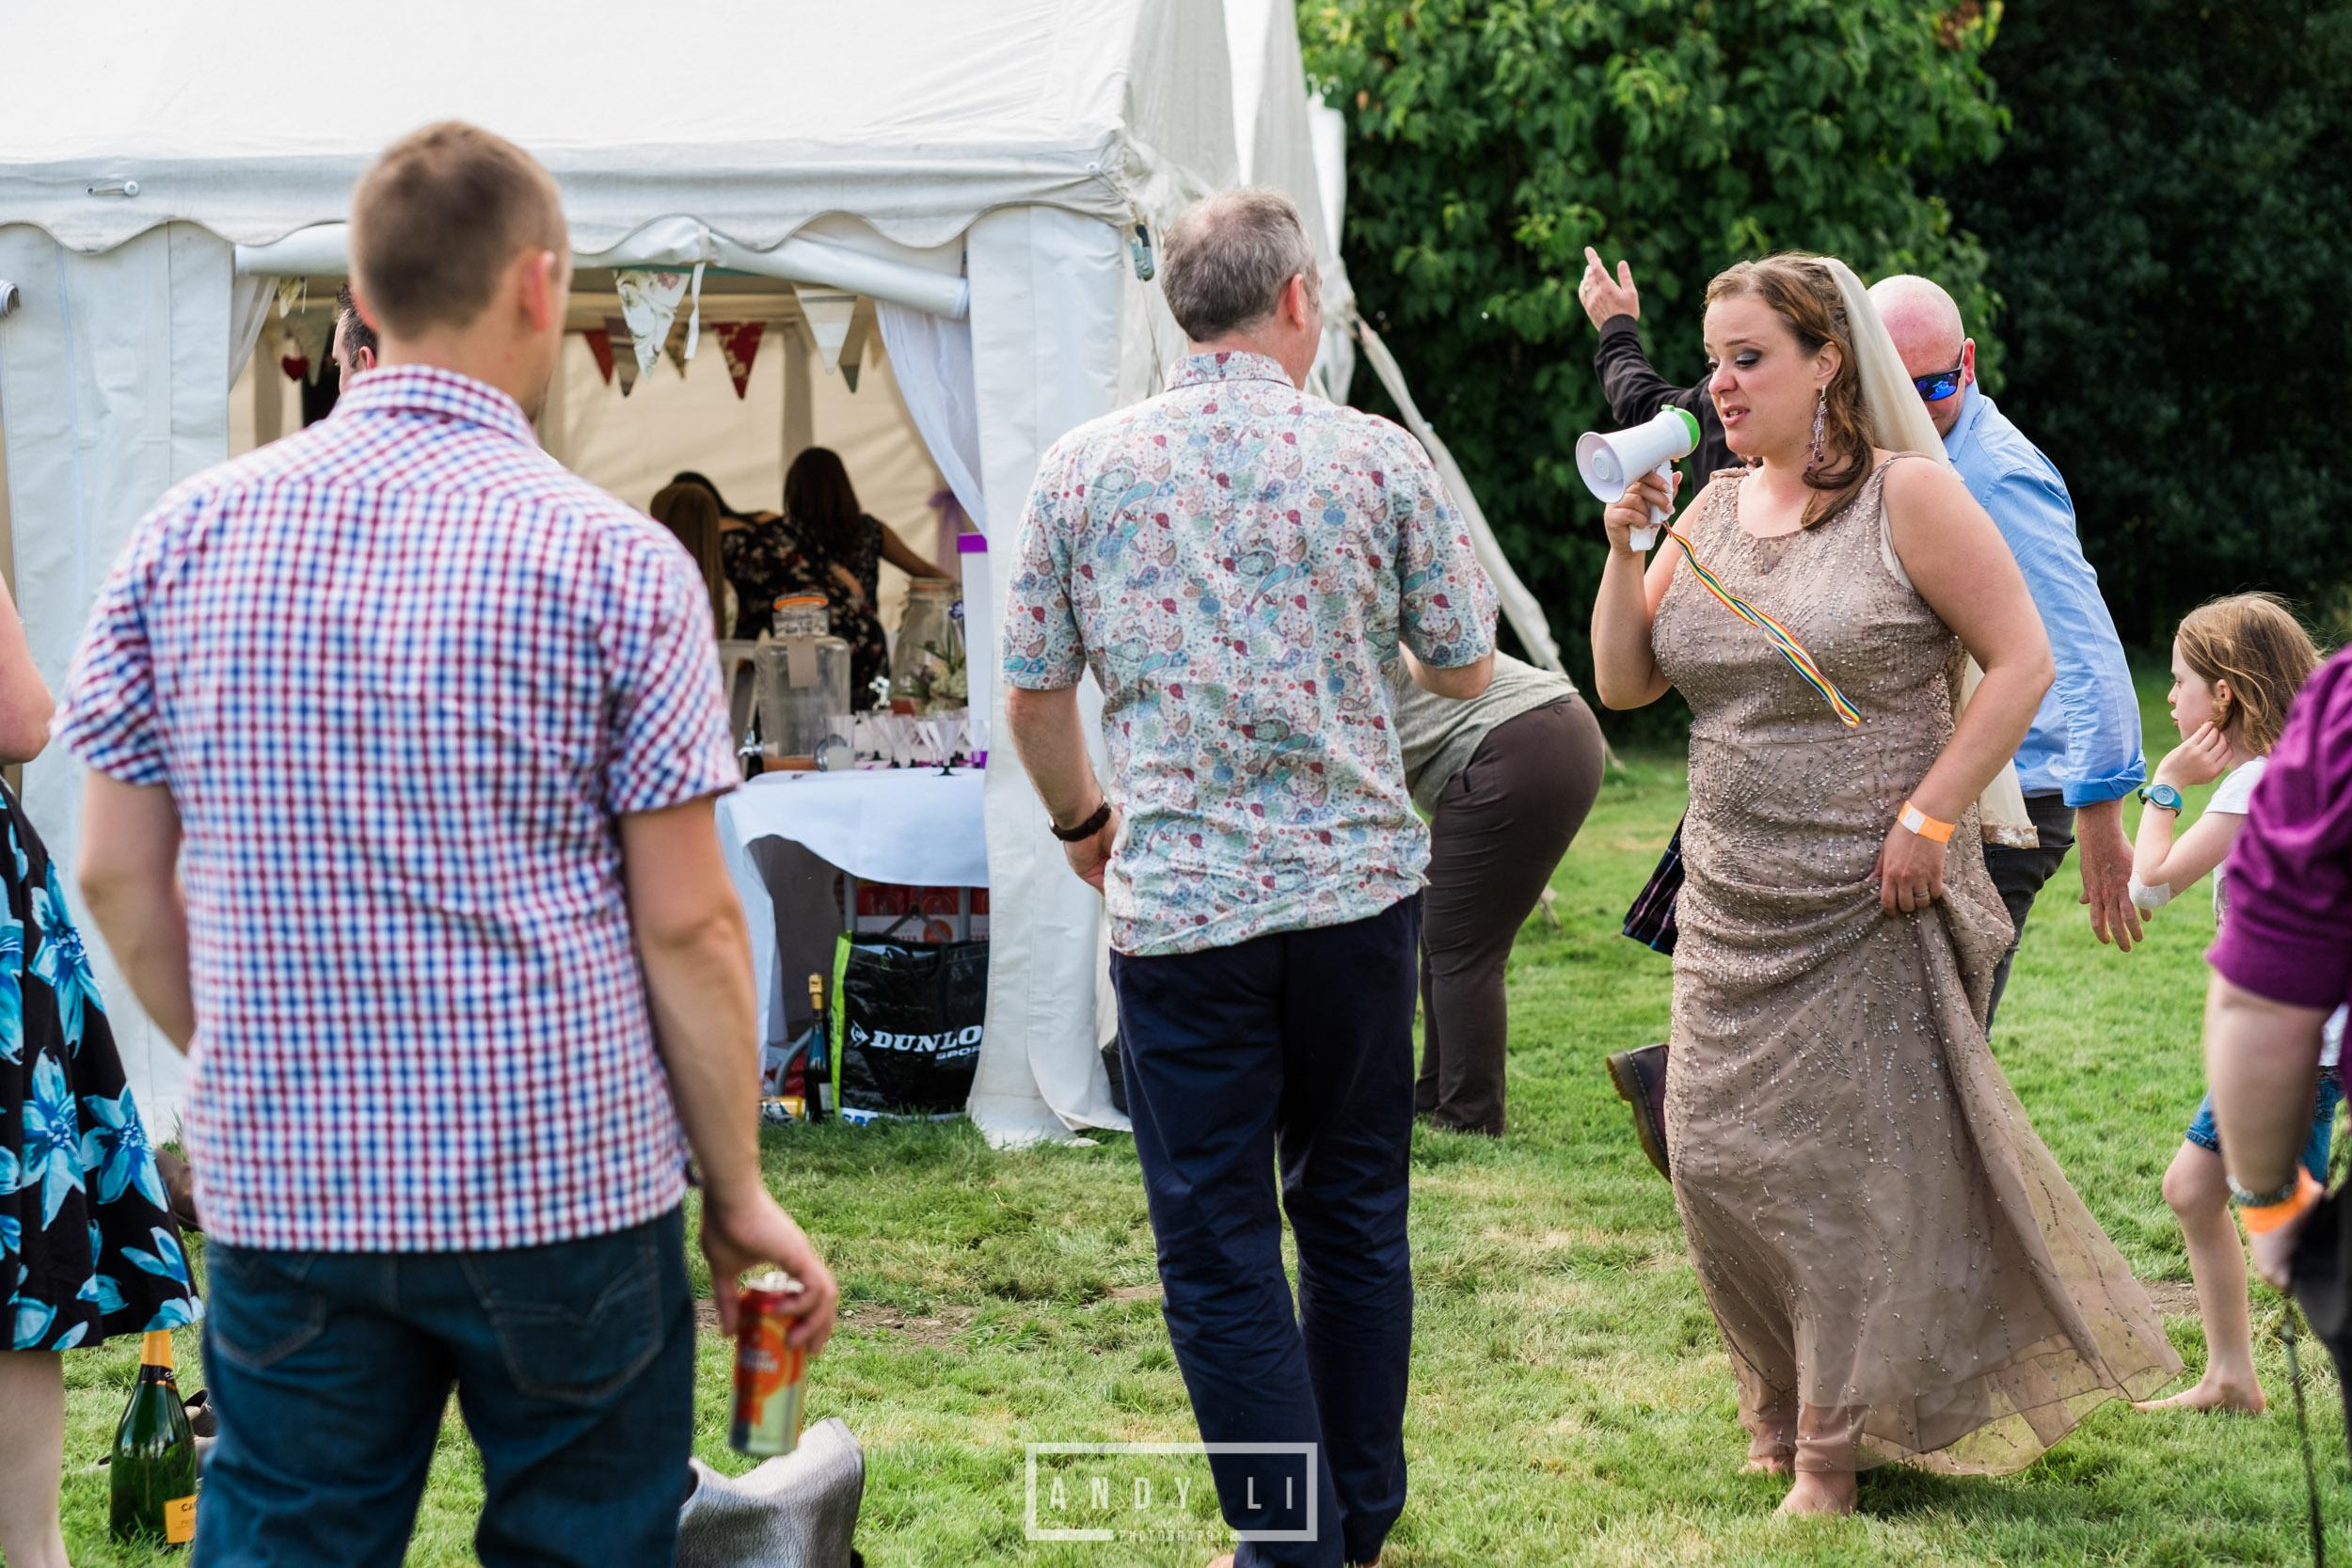 Festival Wedding Shropshire-Andy Li Photography-337.jpg